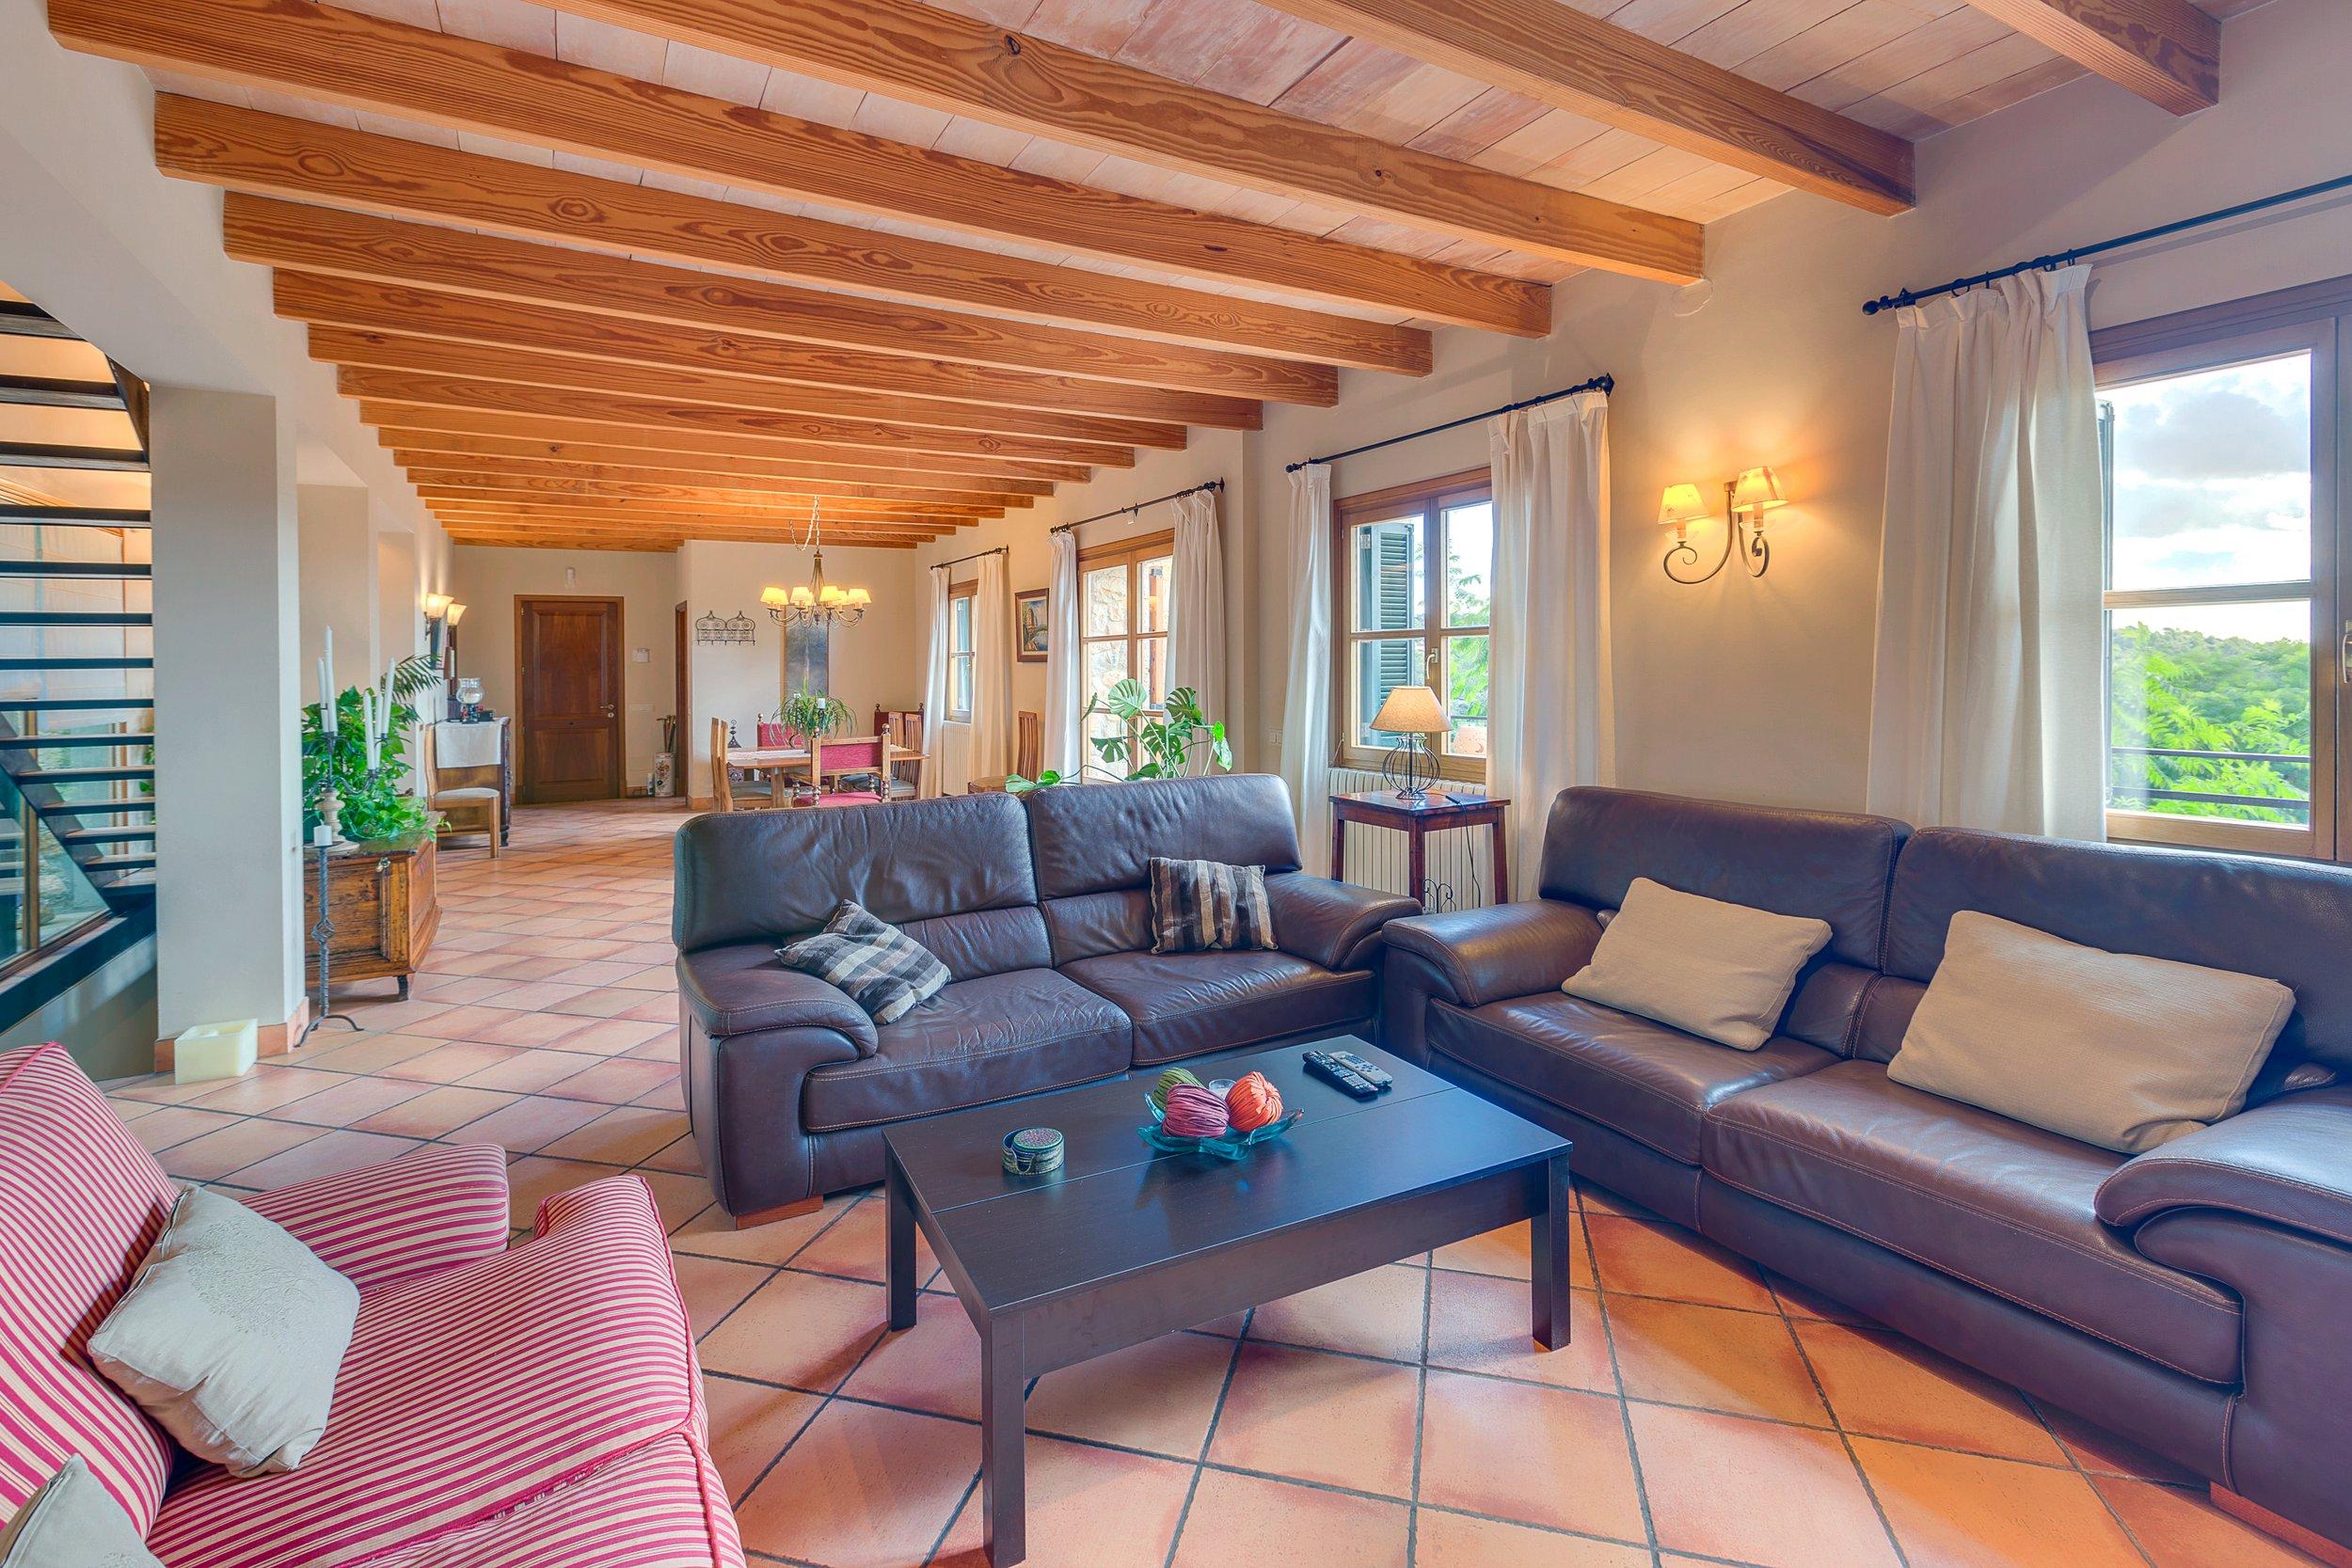 Maison de vacances Villa Cirera in Alaro (2611793), Alaro, Majorque, Iles Baléares, Espagne, image 15